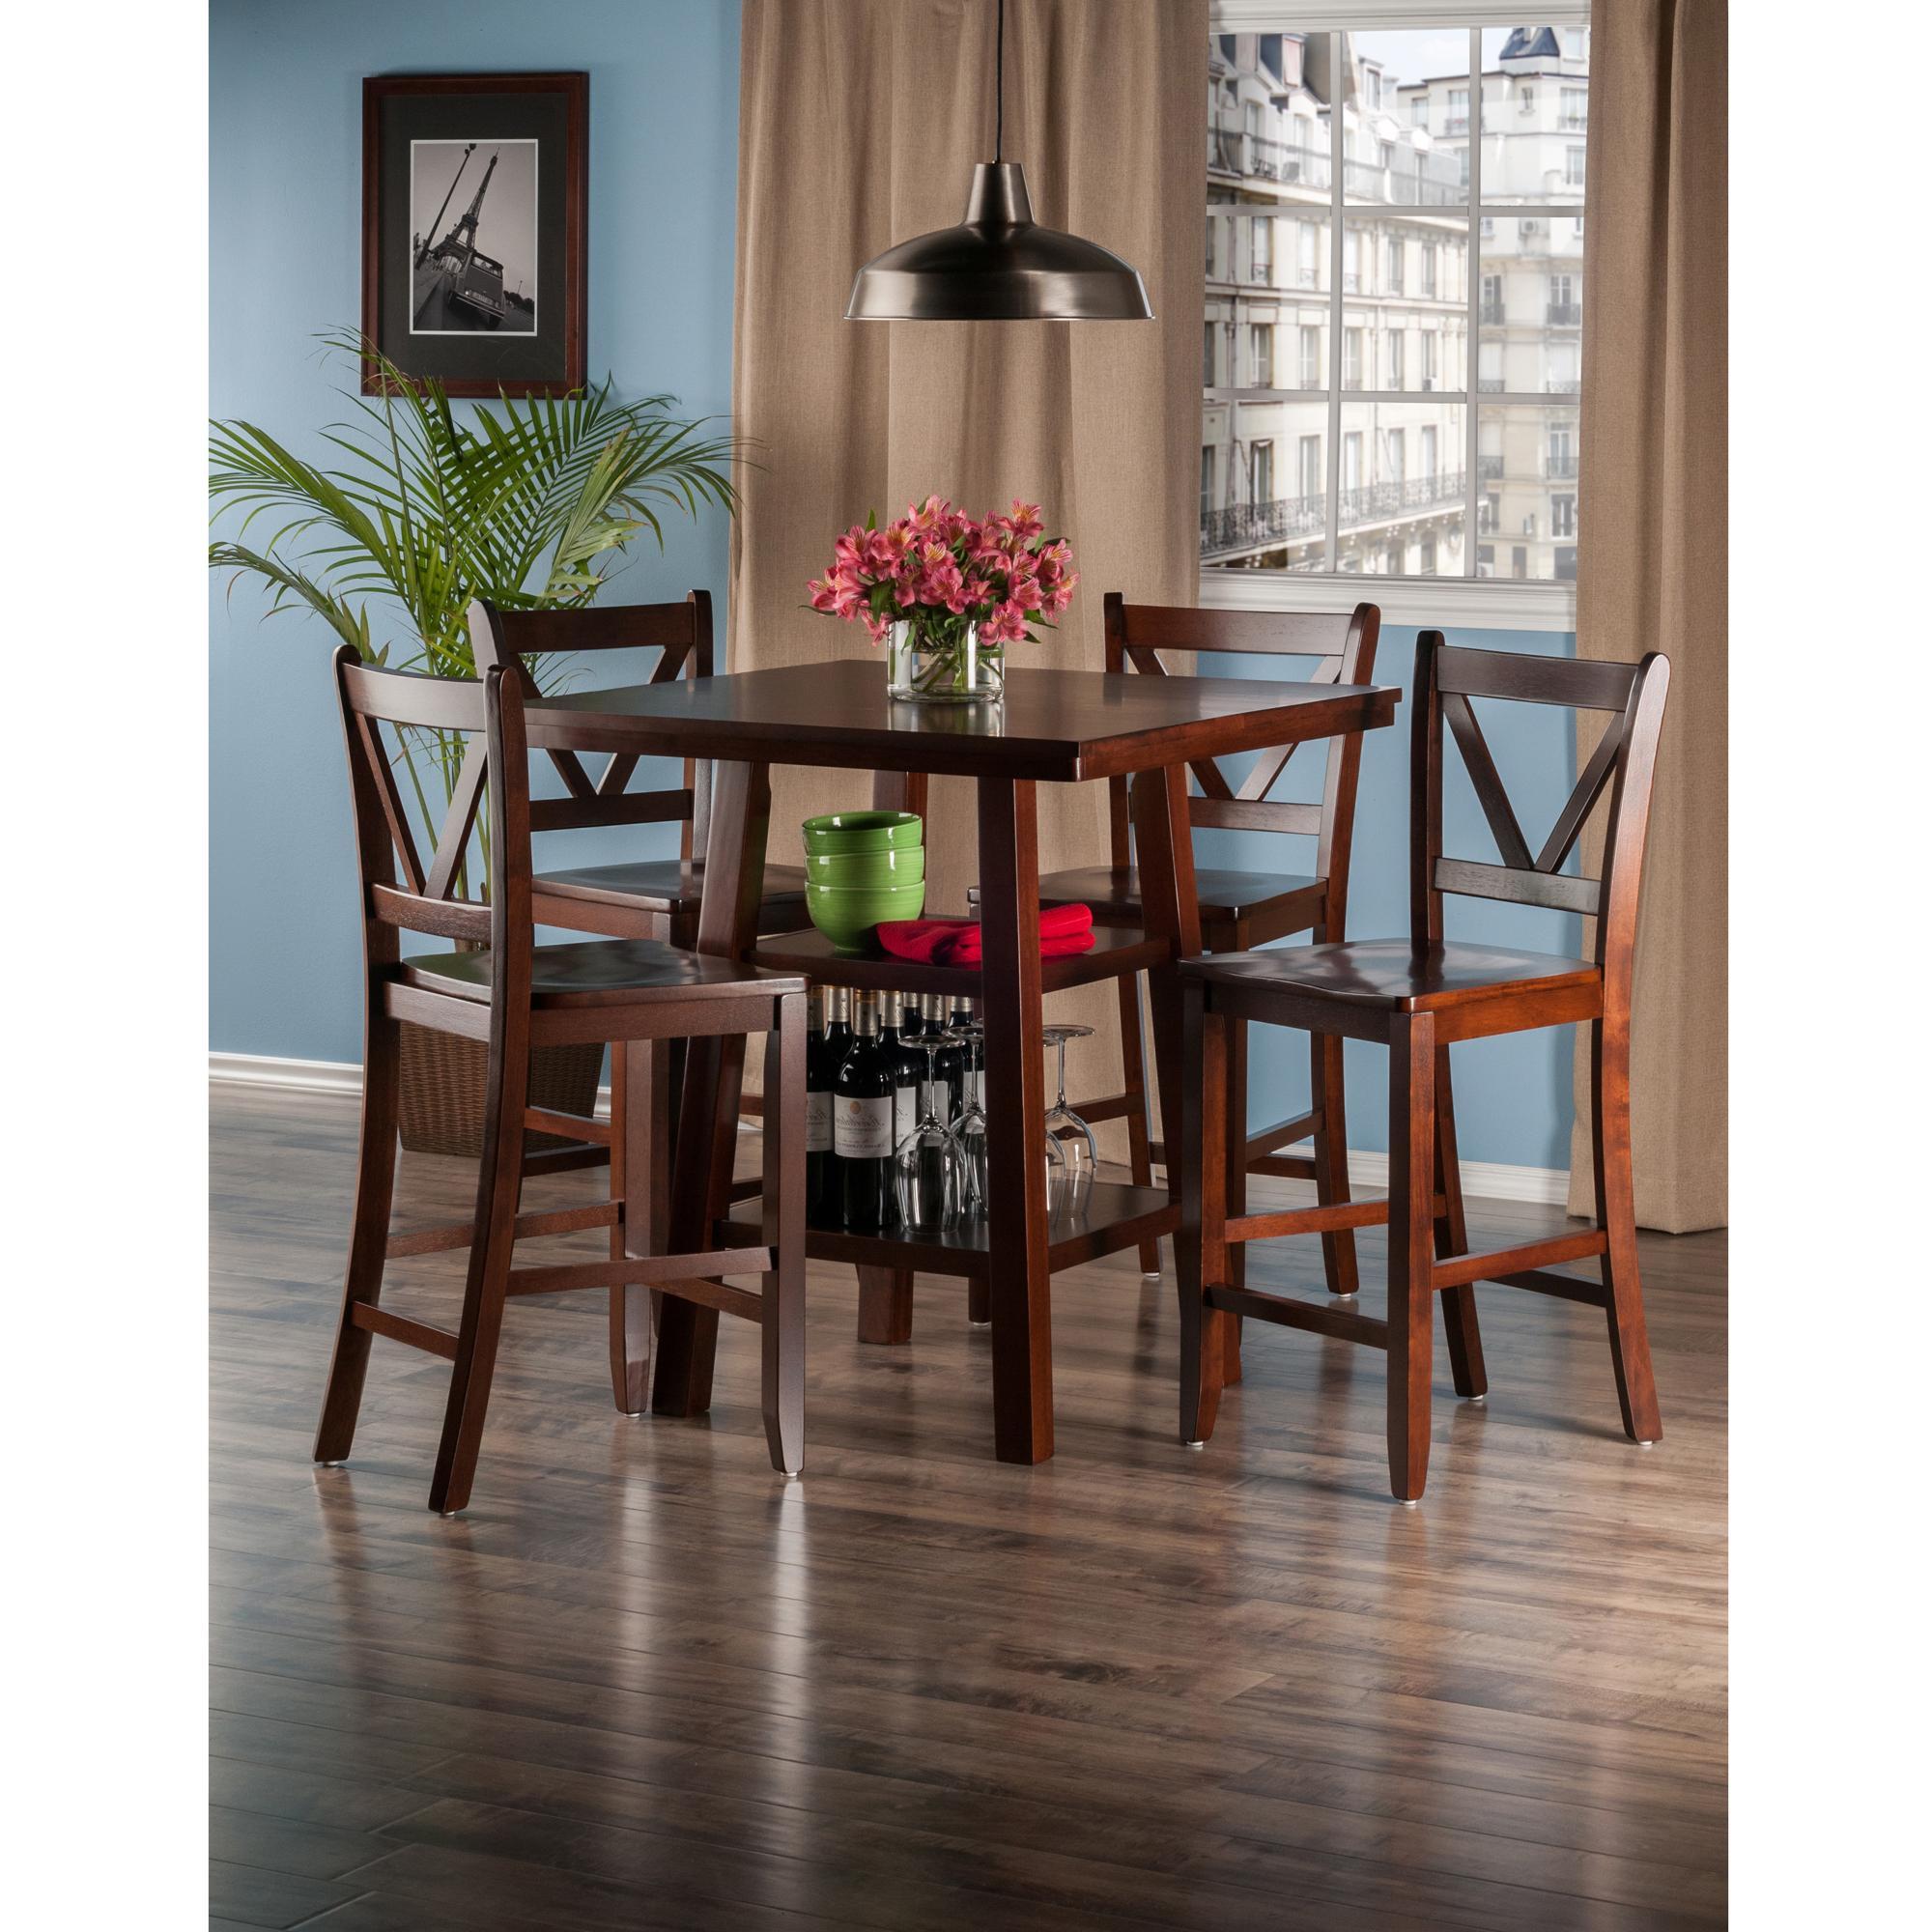 Elegant Orlando 5 Pc Set High Table, 2 Shelves W/ 4 V Back Counter Stools